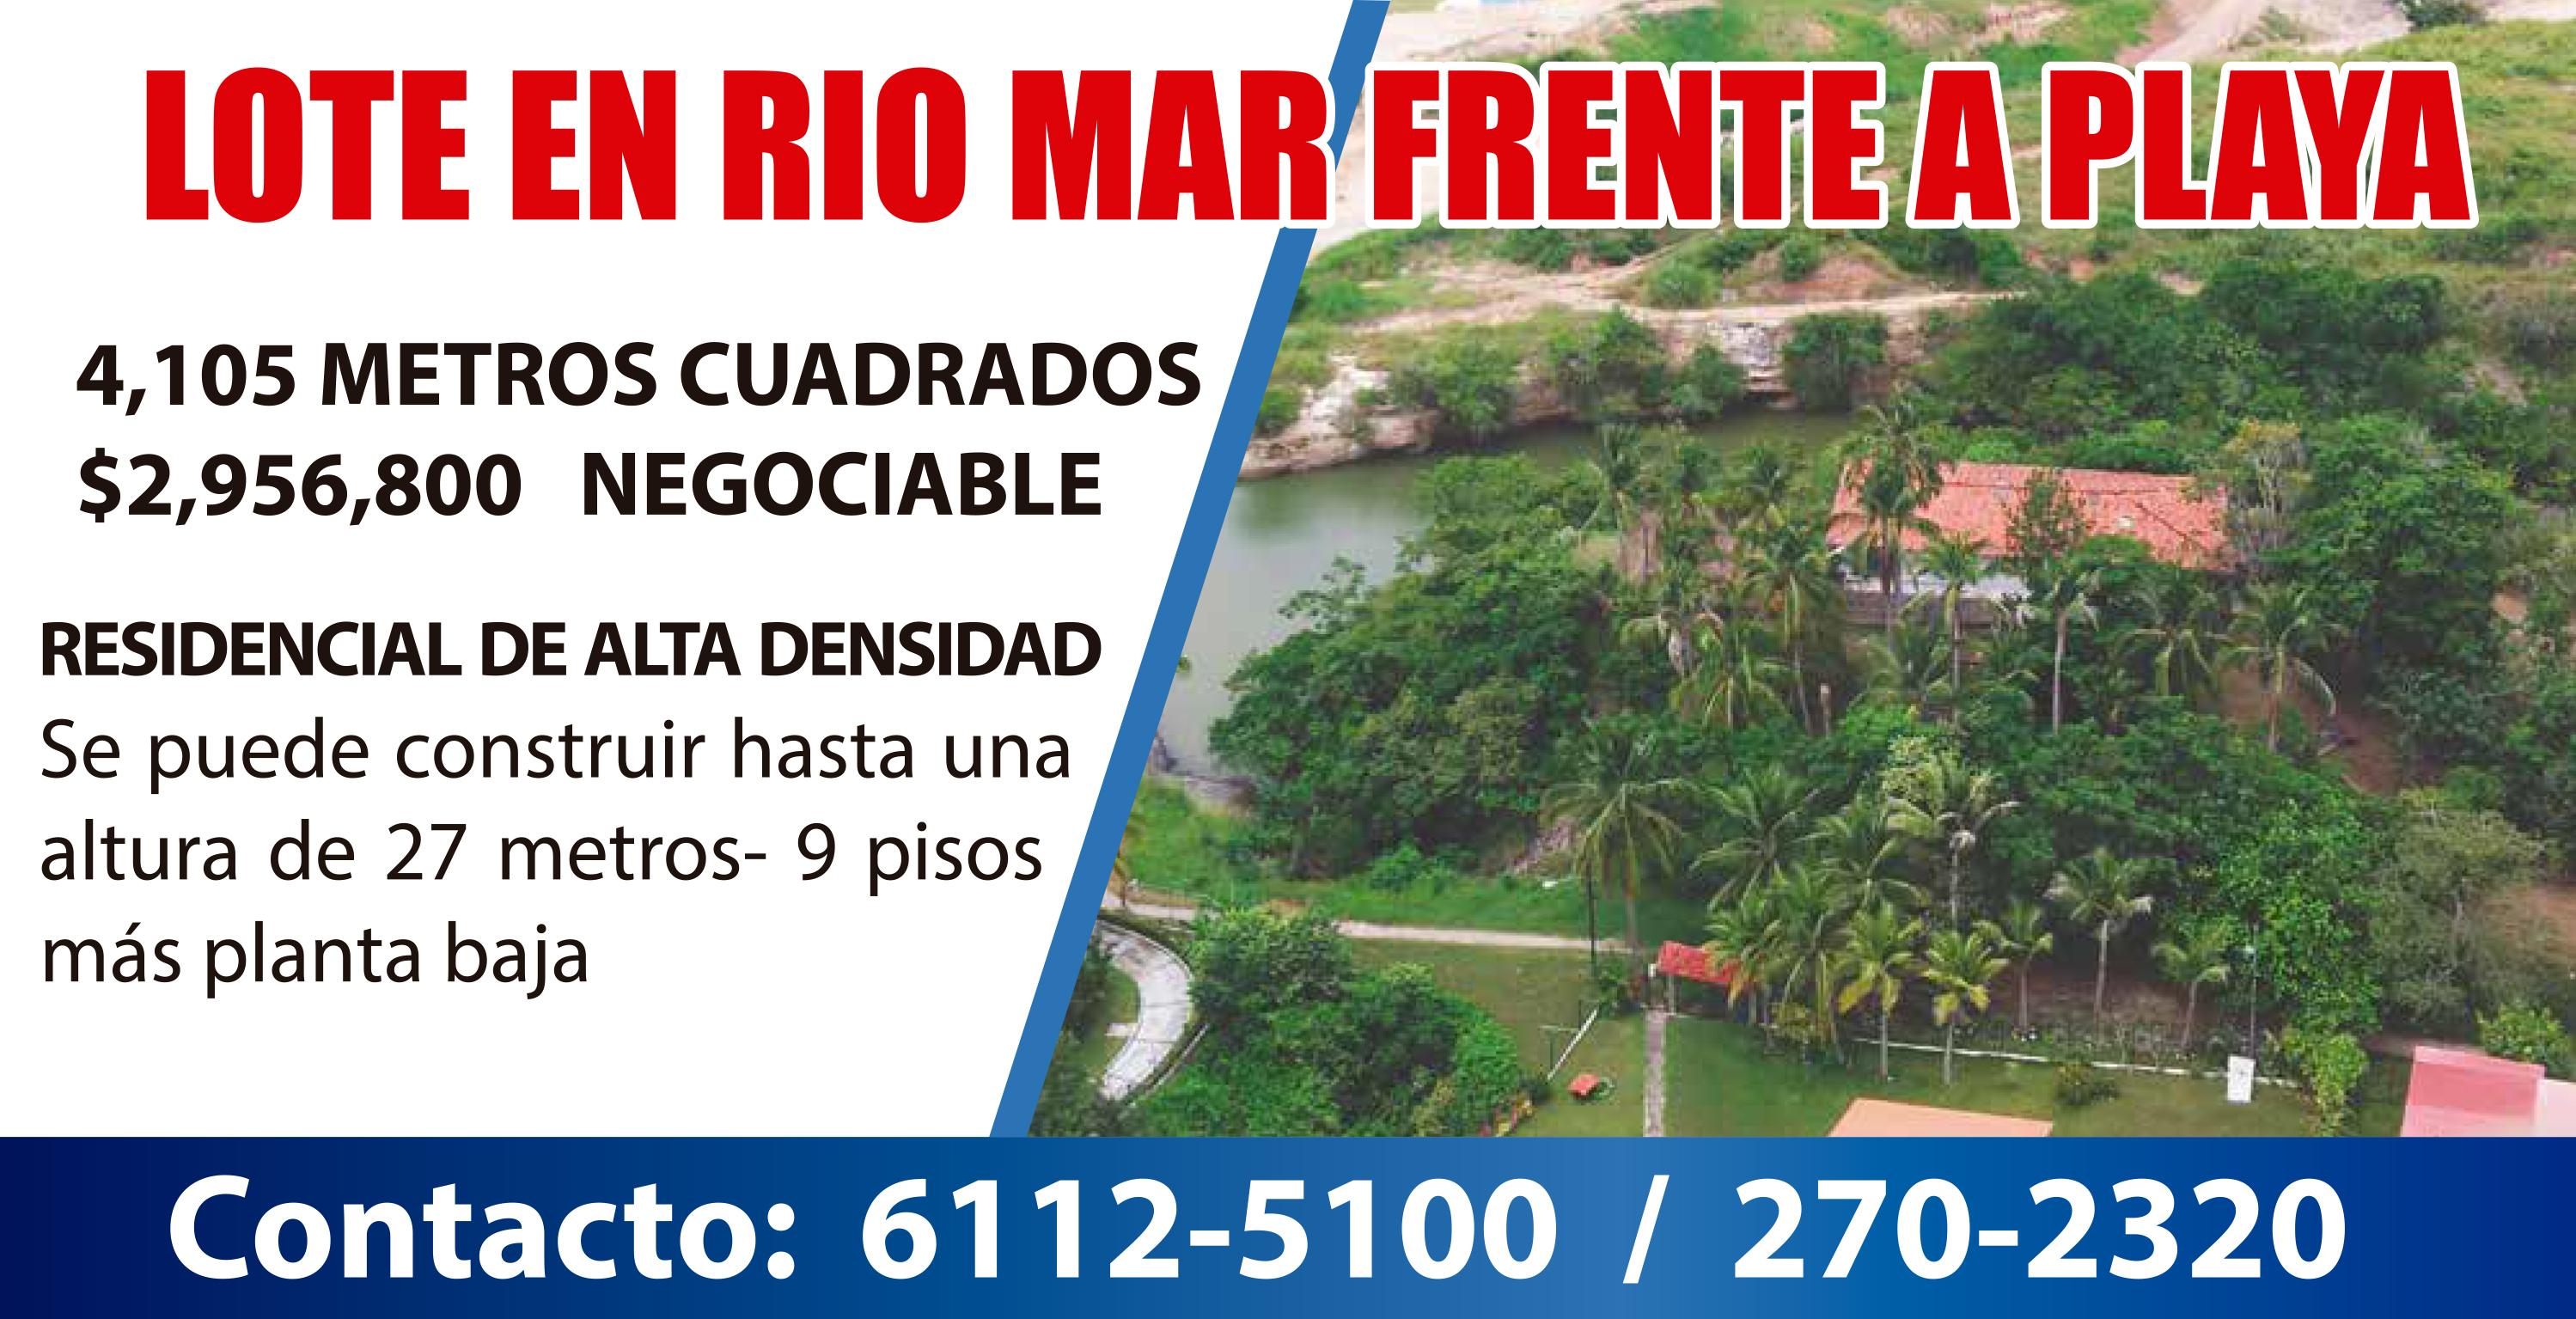 LOTE EN RIO MAR FRENTE A PLAYA